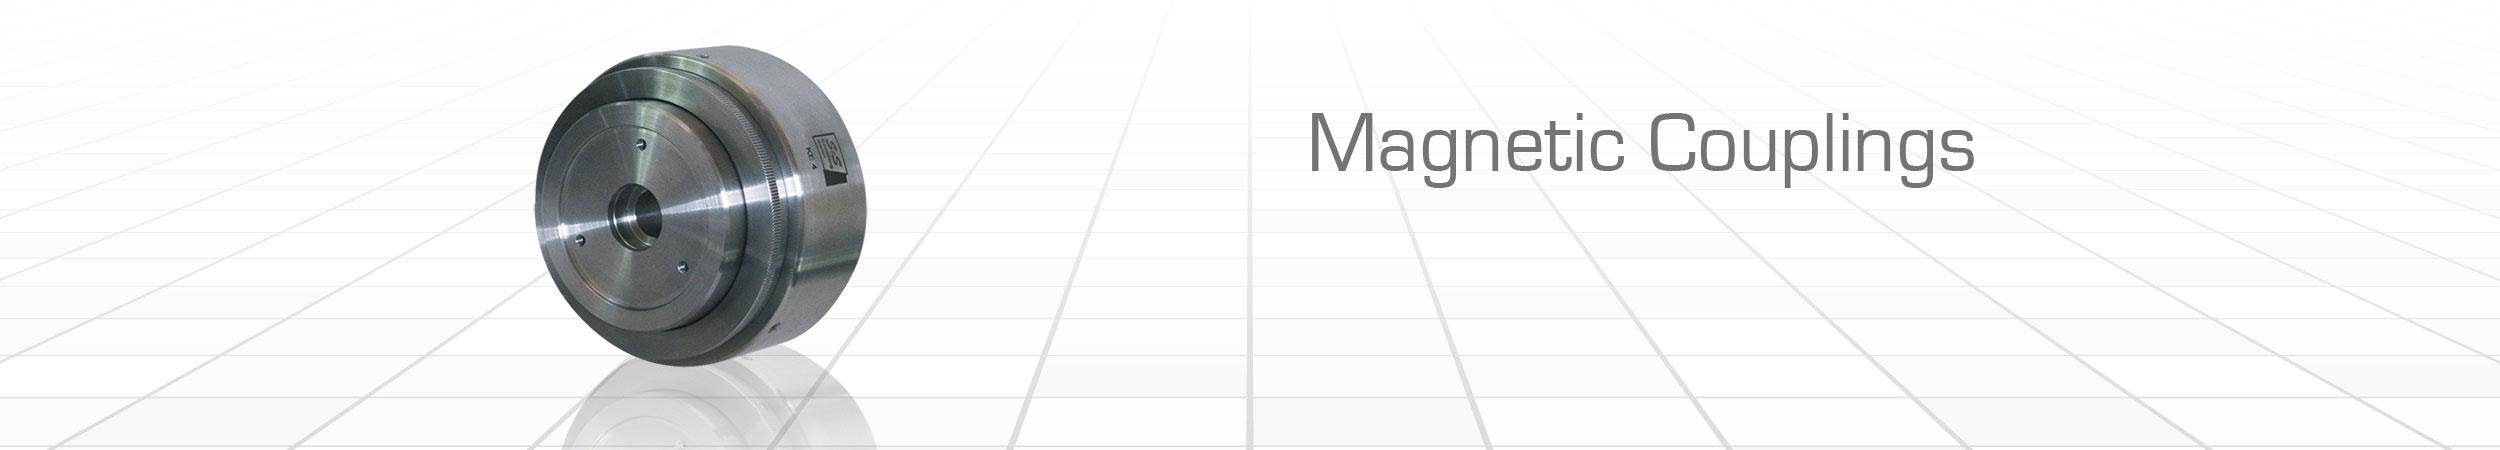 Magnetic Couplings